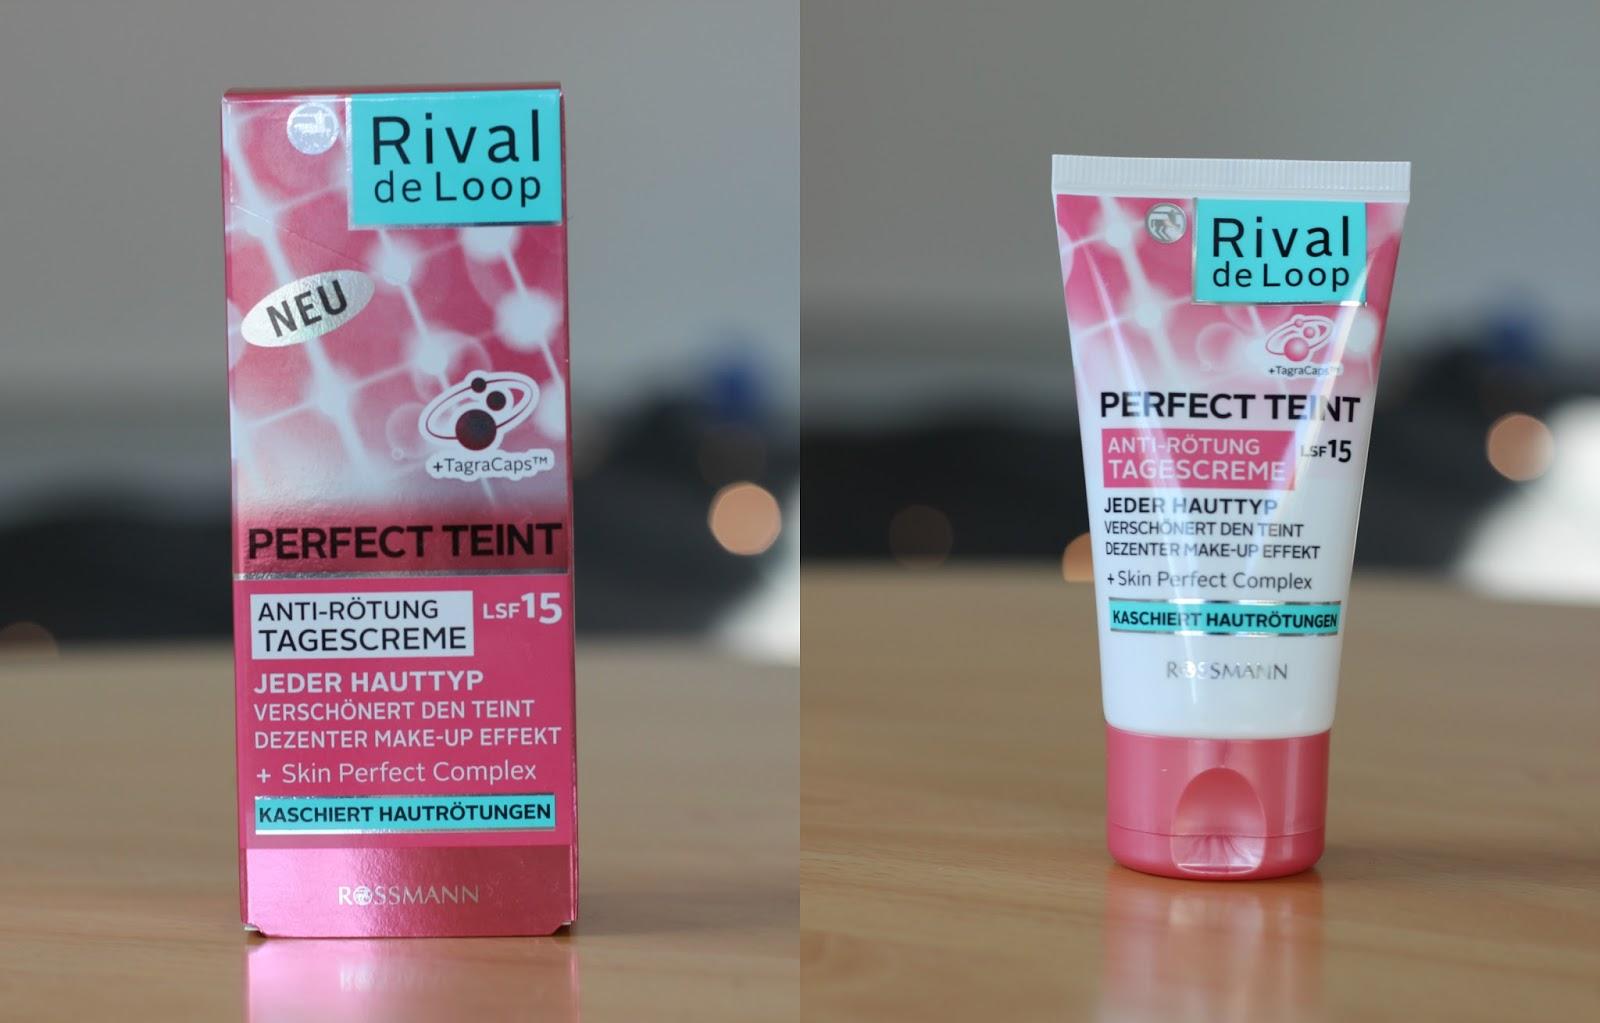 Farbspezial Wie Kombiniere Ich Die Trendfarbe Taupe: HeartBeauty09: Rival De Loop Perfect Teint Anti- Rötung